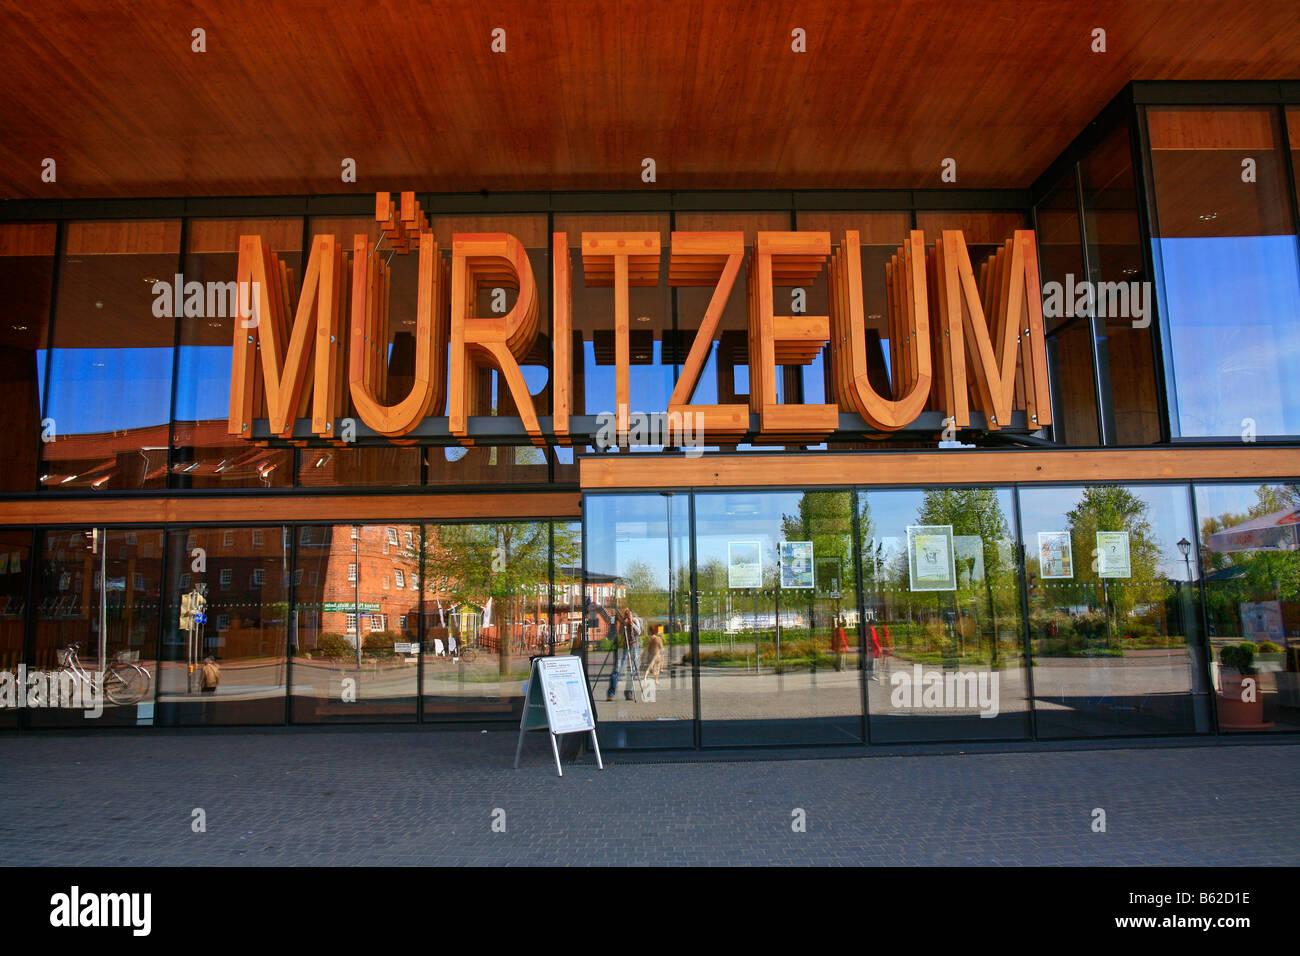 Mueritzeum in capital letters, Germany's largest aquarium for native freshwater fish, Waren on the Mueritz, - Stock Image